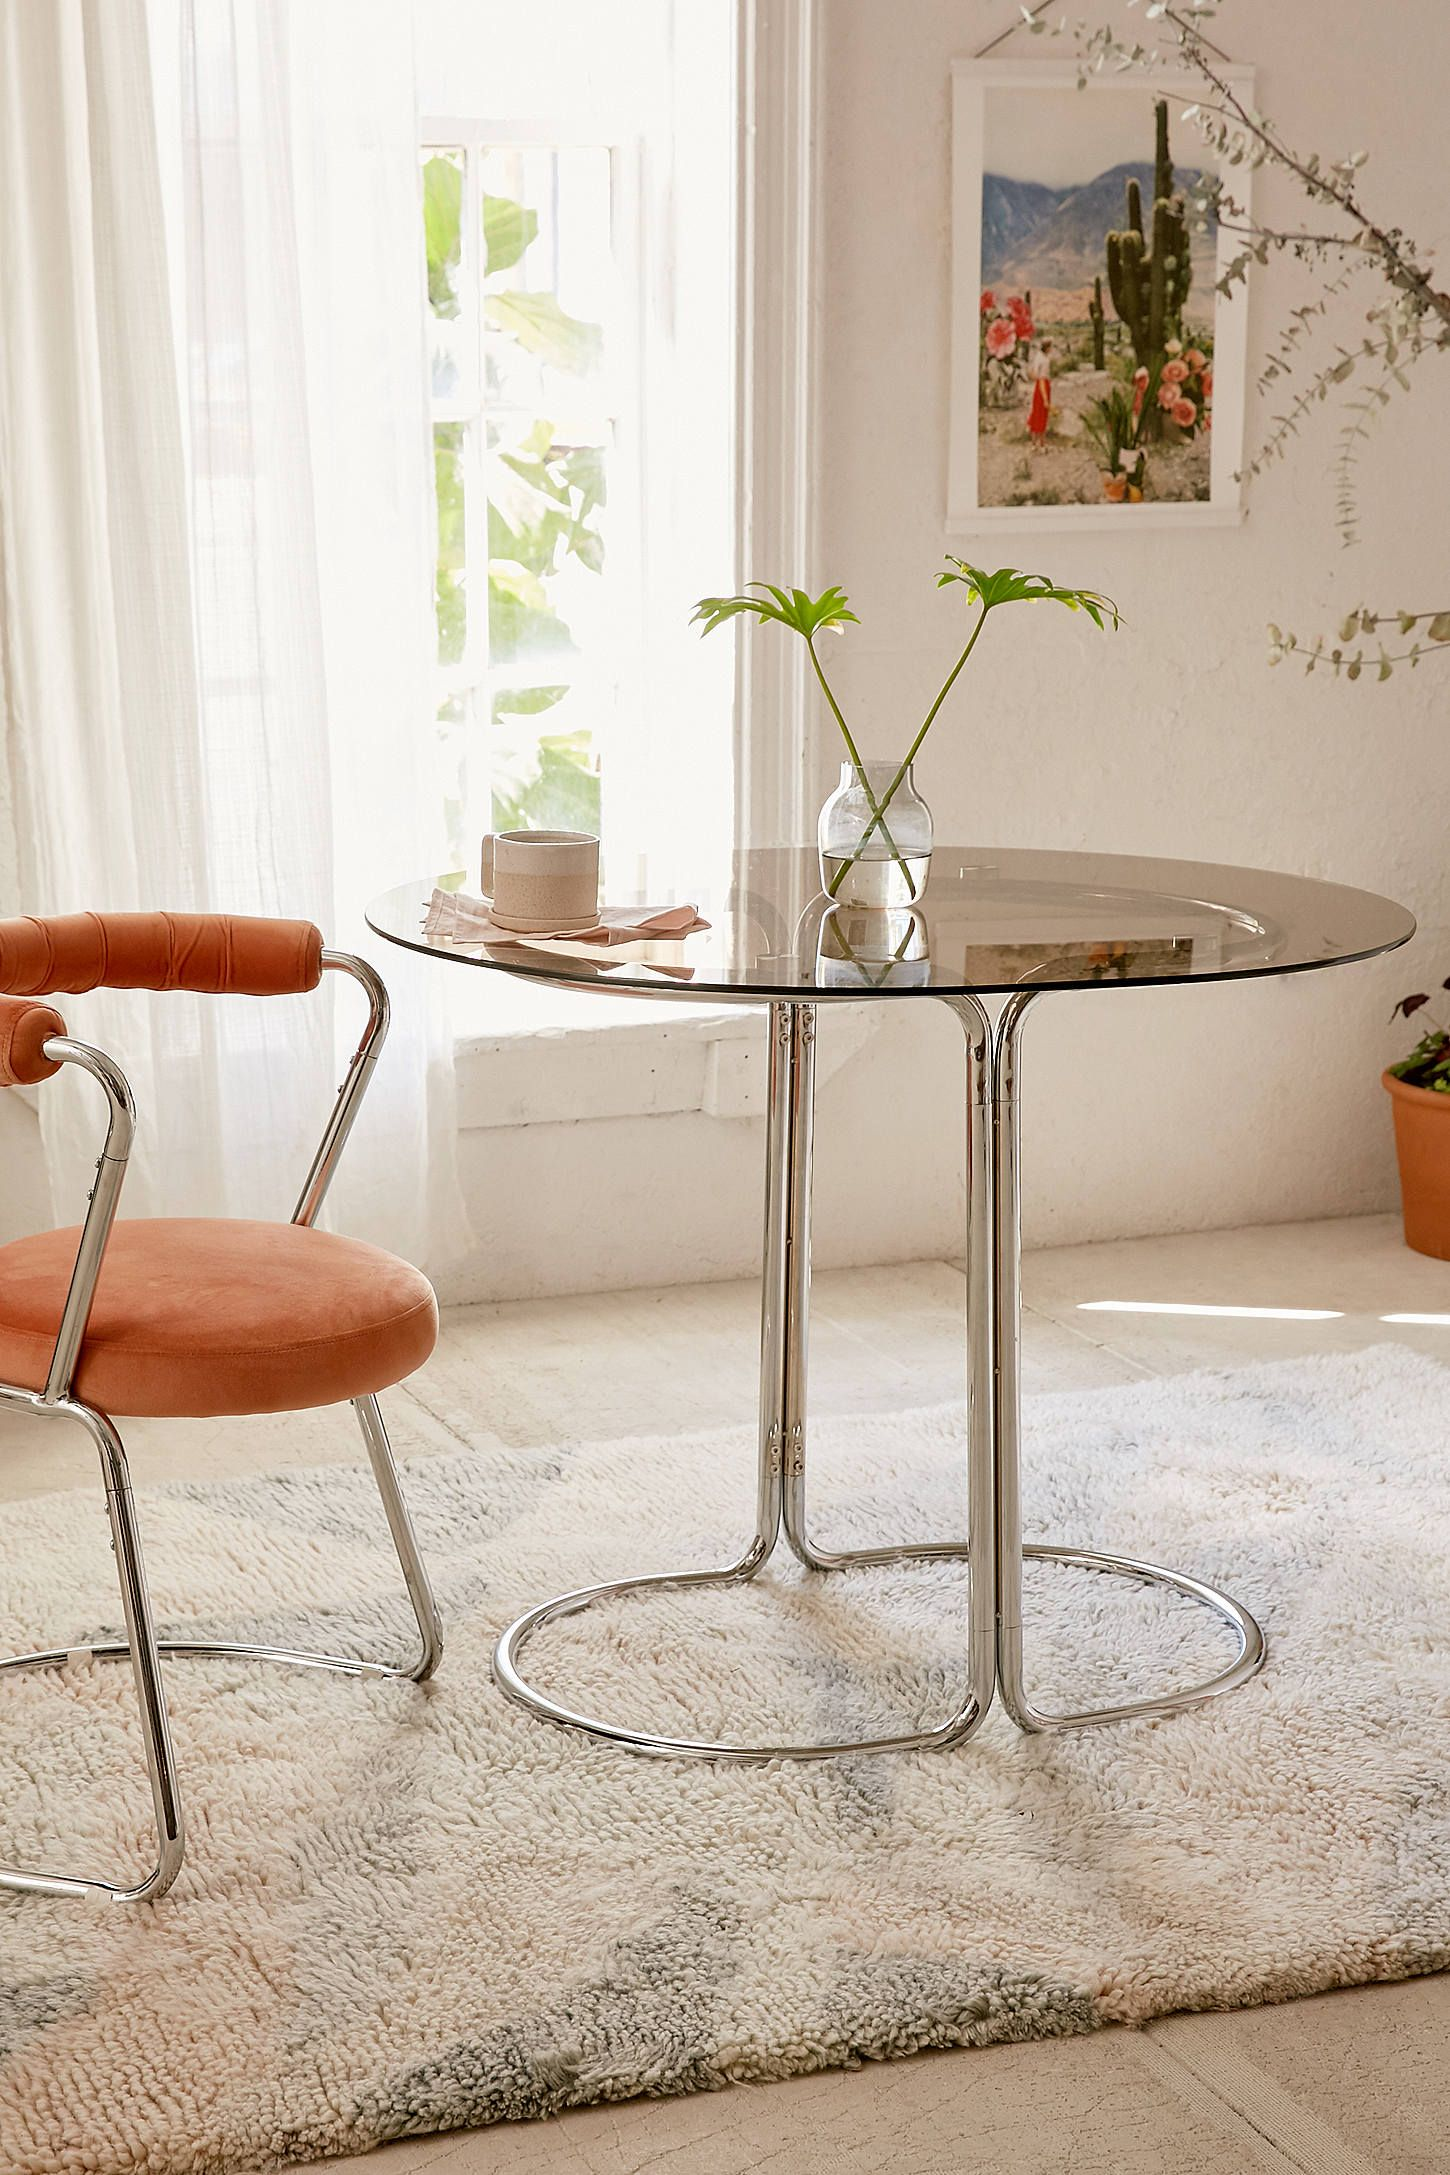 Avery Bistro Table | Decor, Patio furniture sets, Urban ...